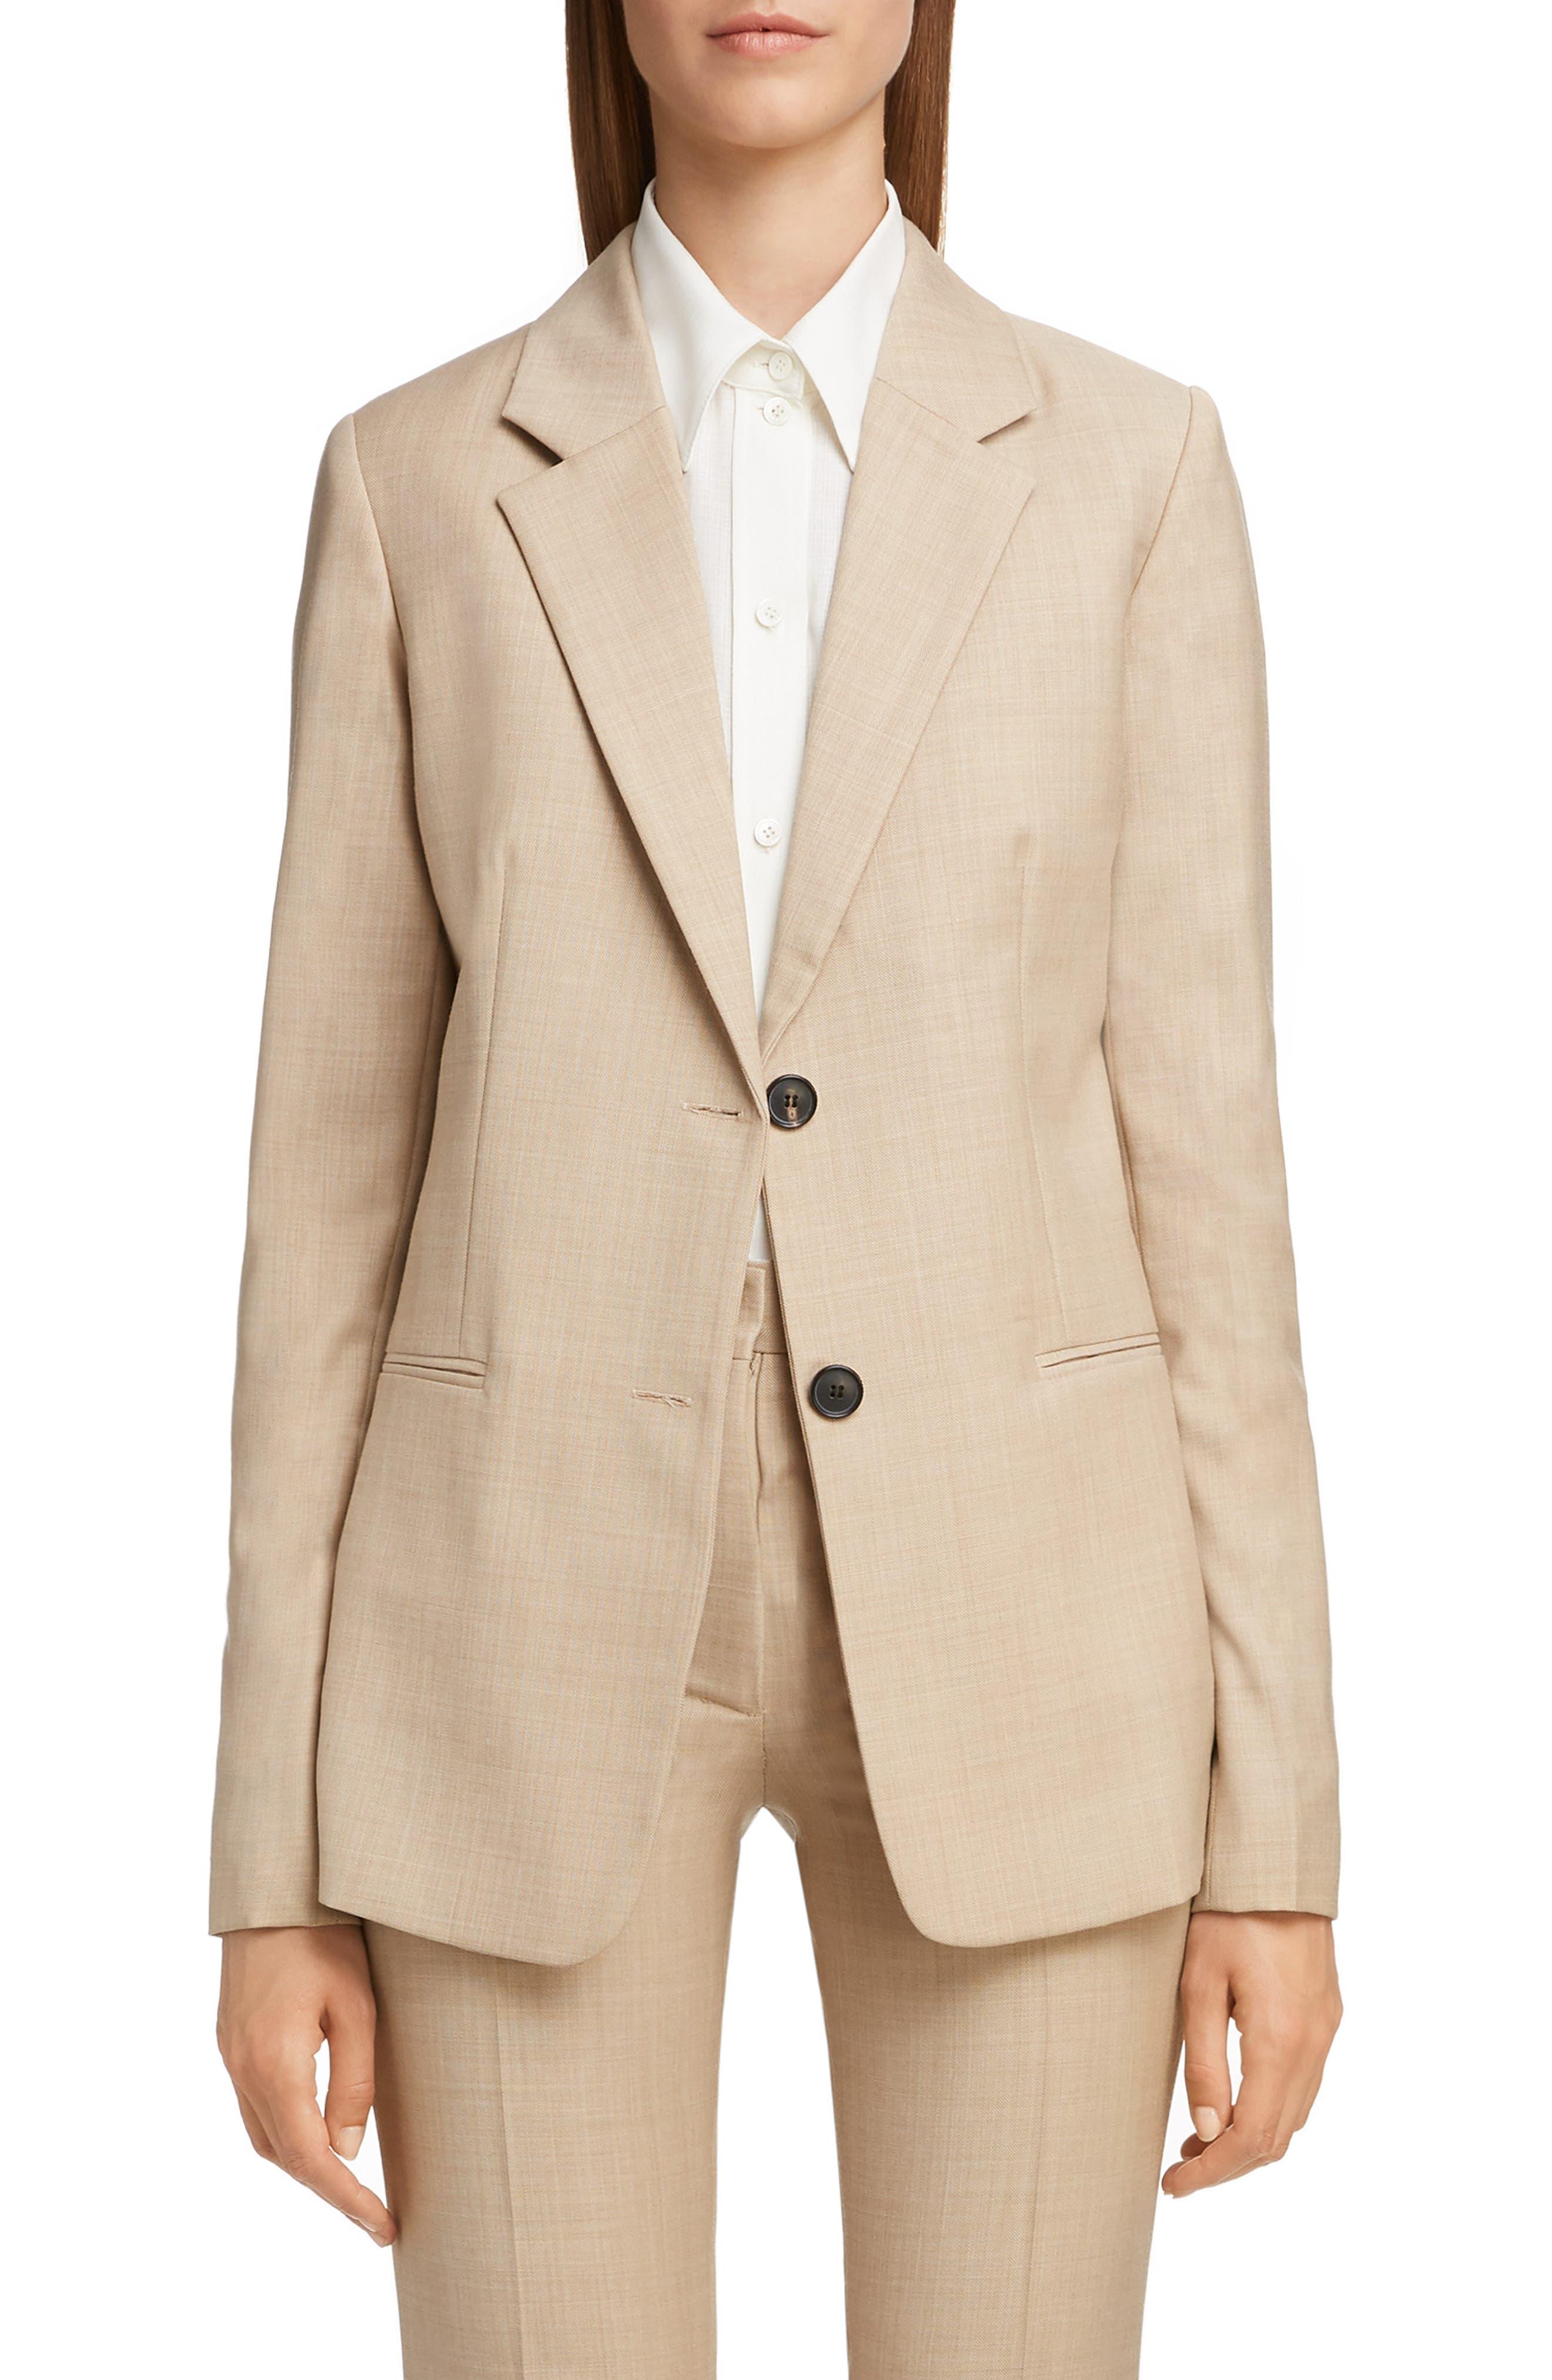 VICTORIA BECKHAM, Wool Jacket, Main thumbnail 1, color, LIGHT BEIGE-WHITE